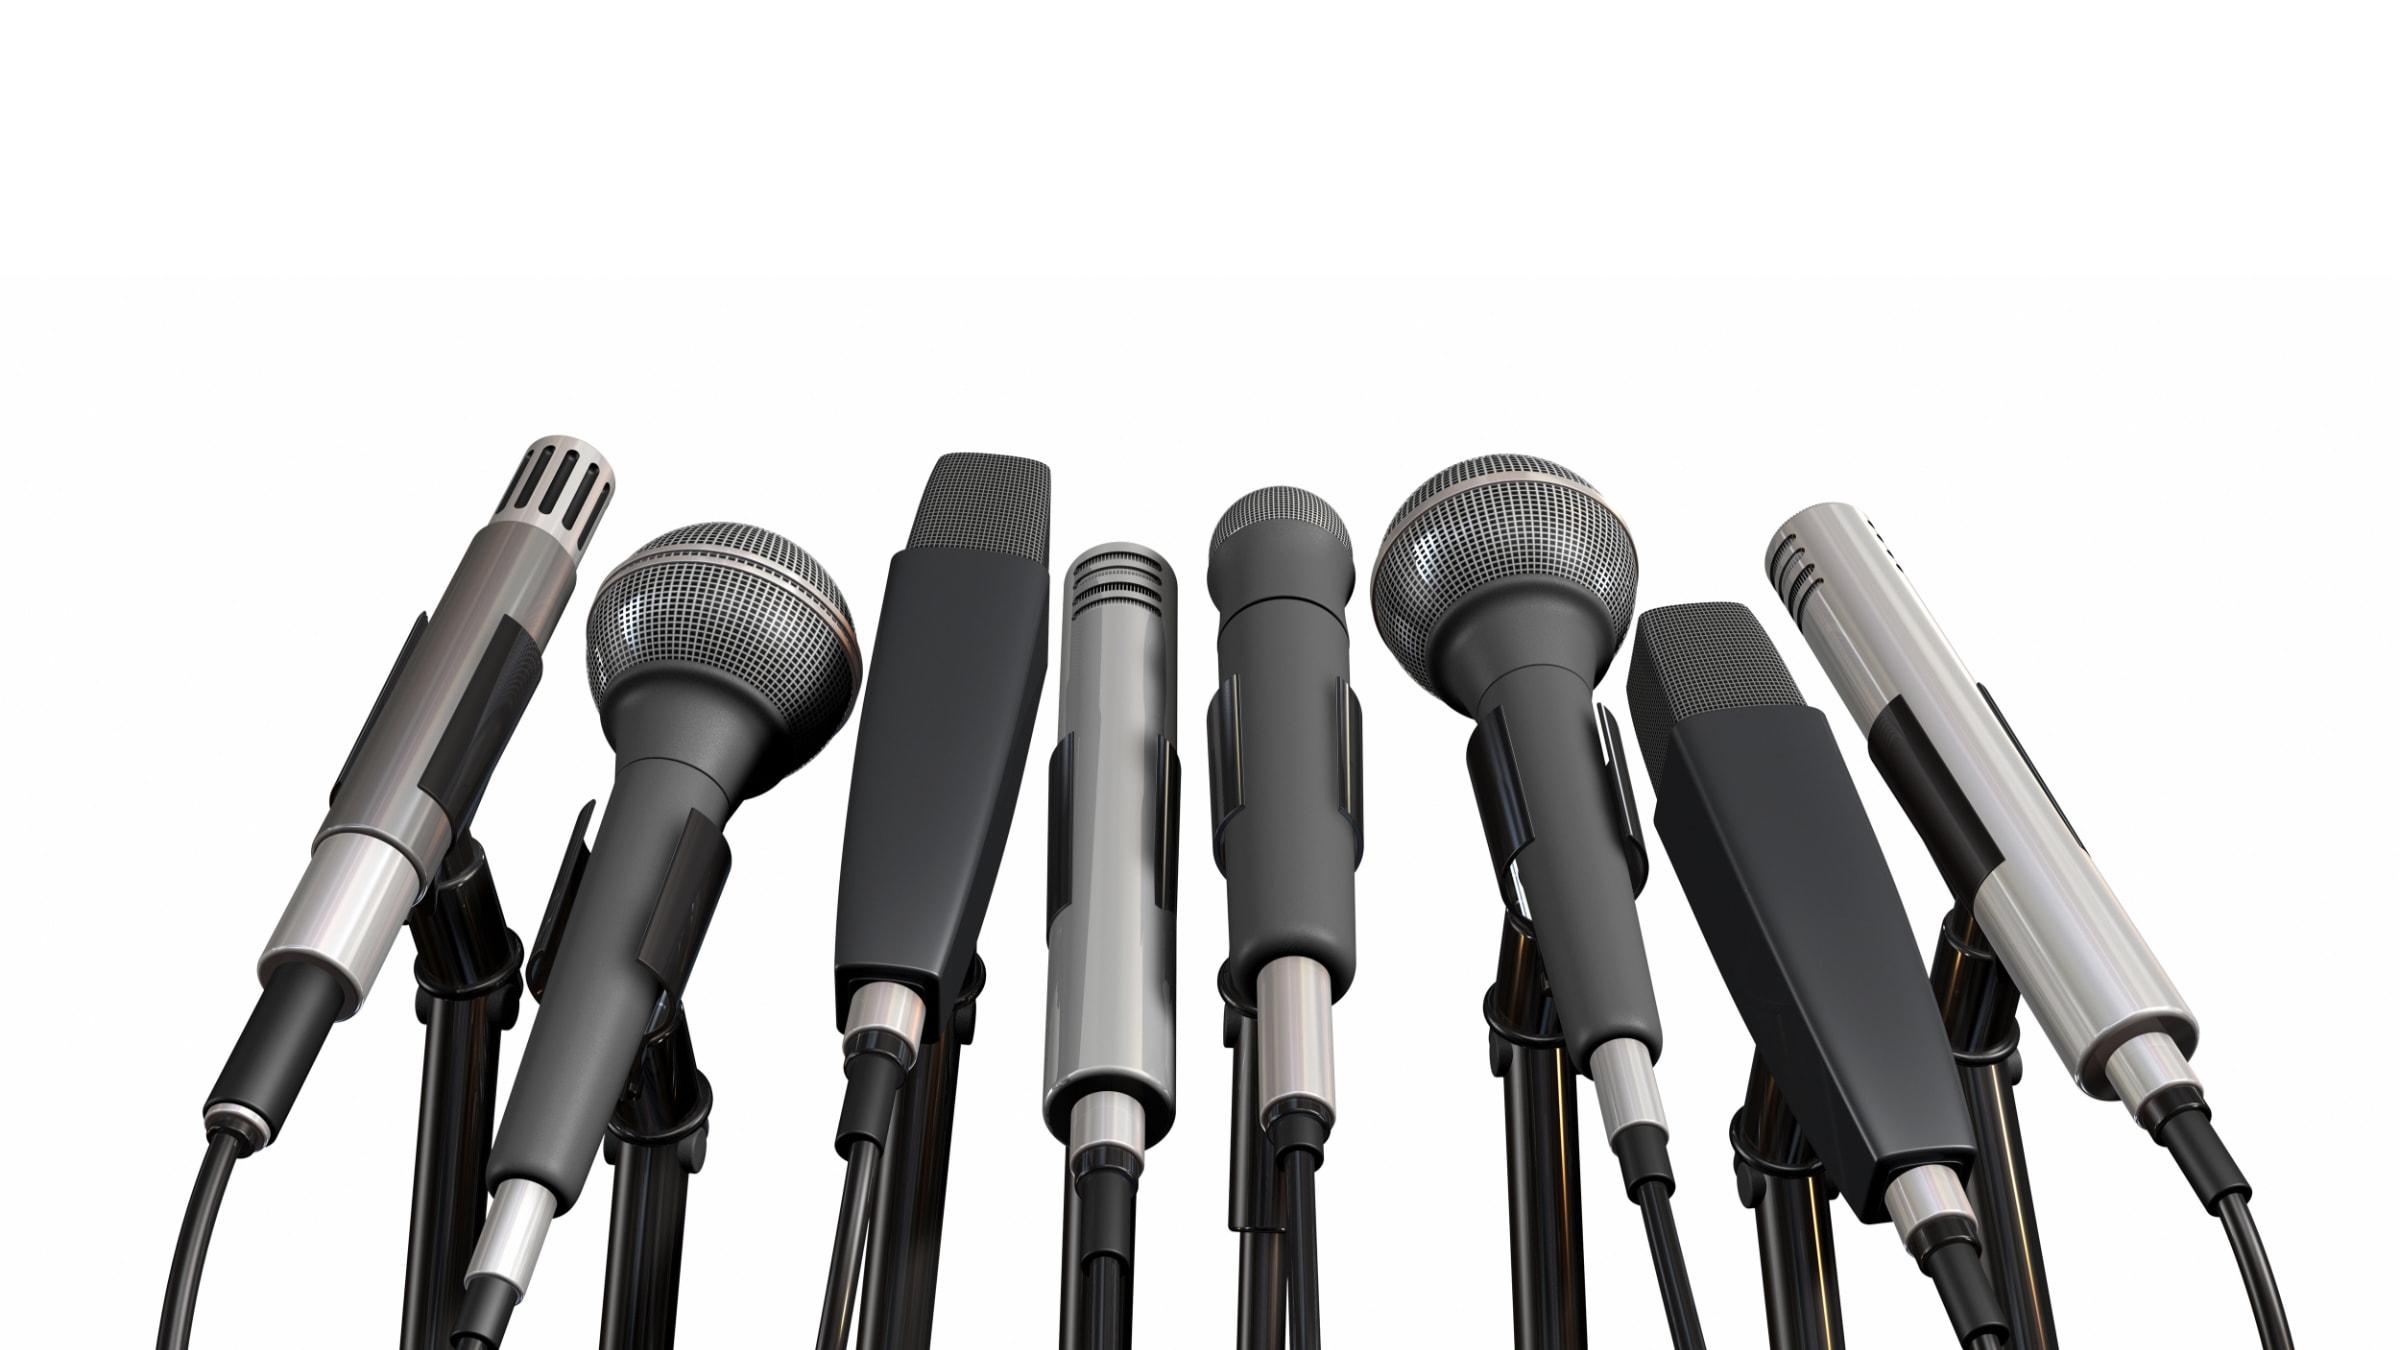 presentation creation agency public speaking coaching and training